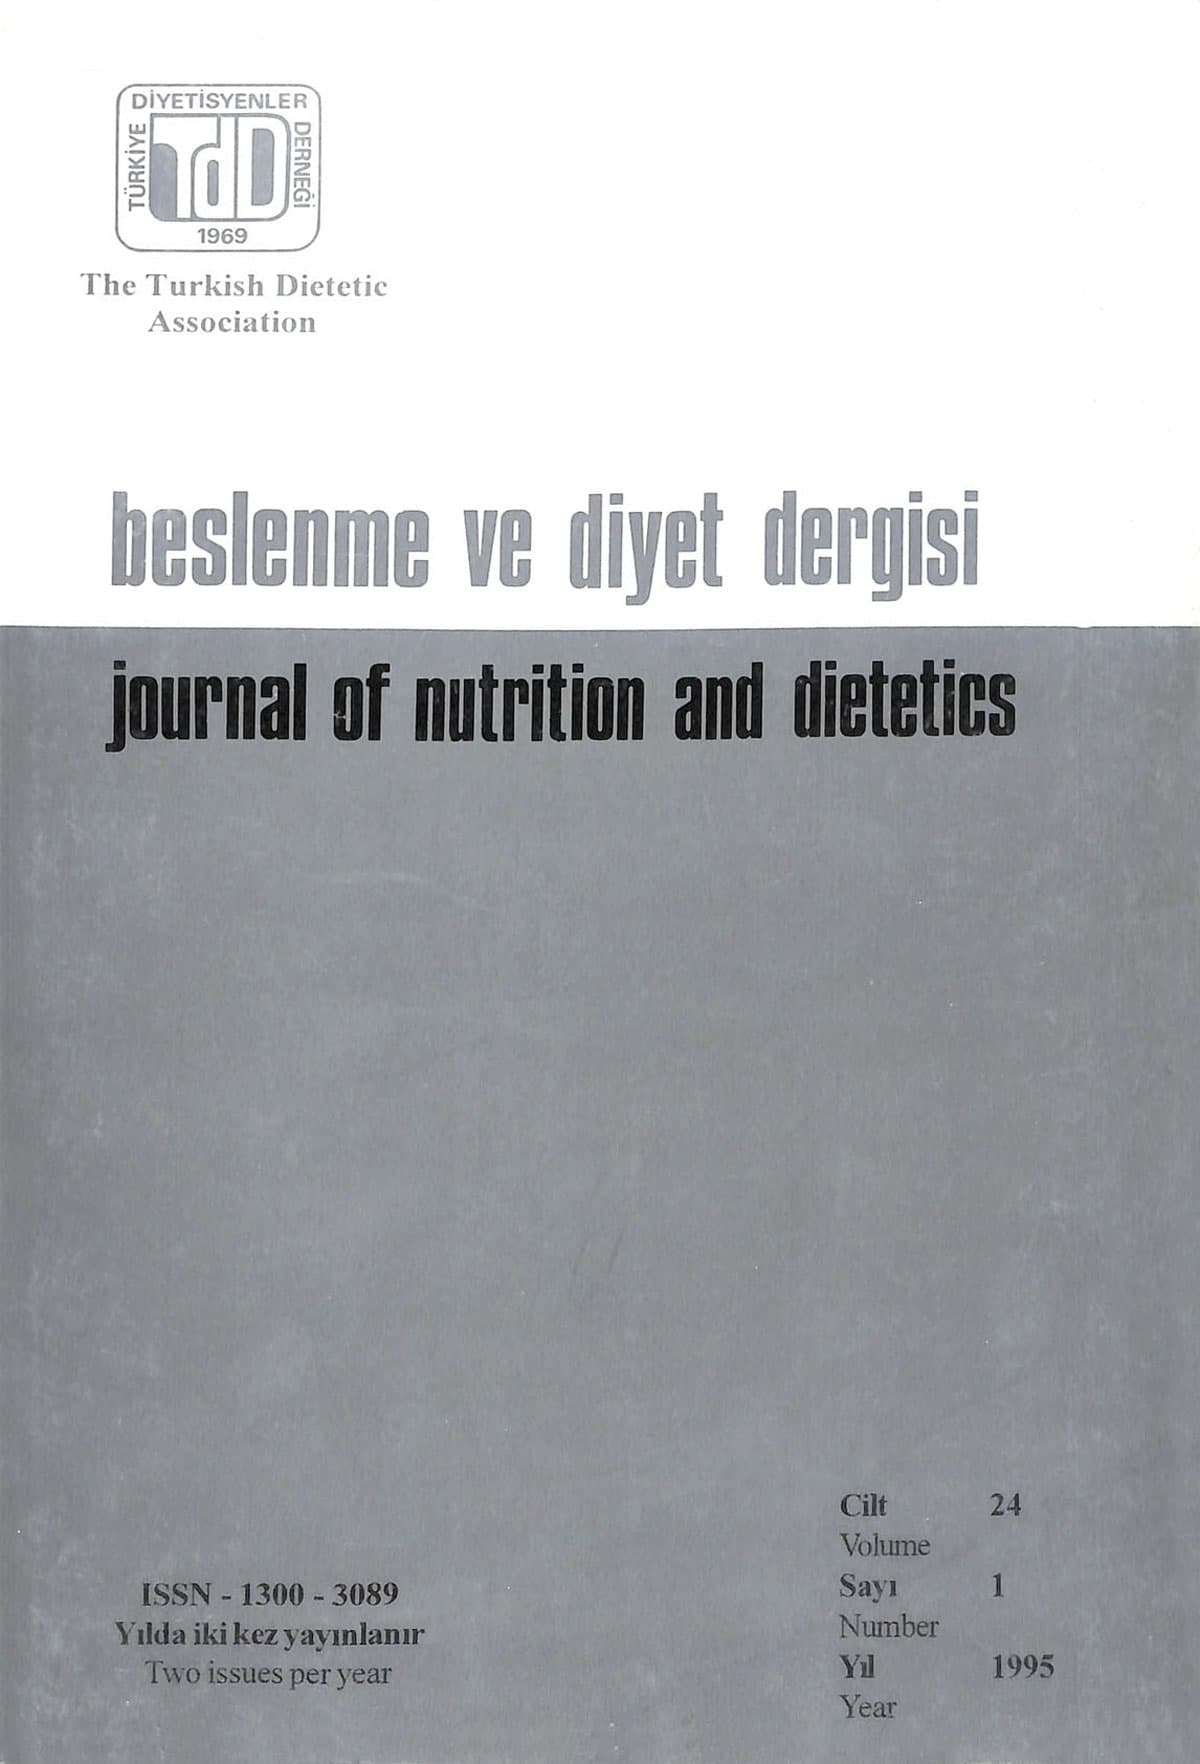 Cilt 24 Sayı 1 (1995)